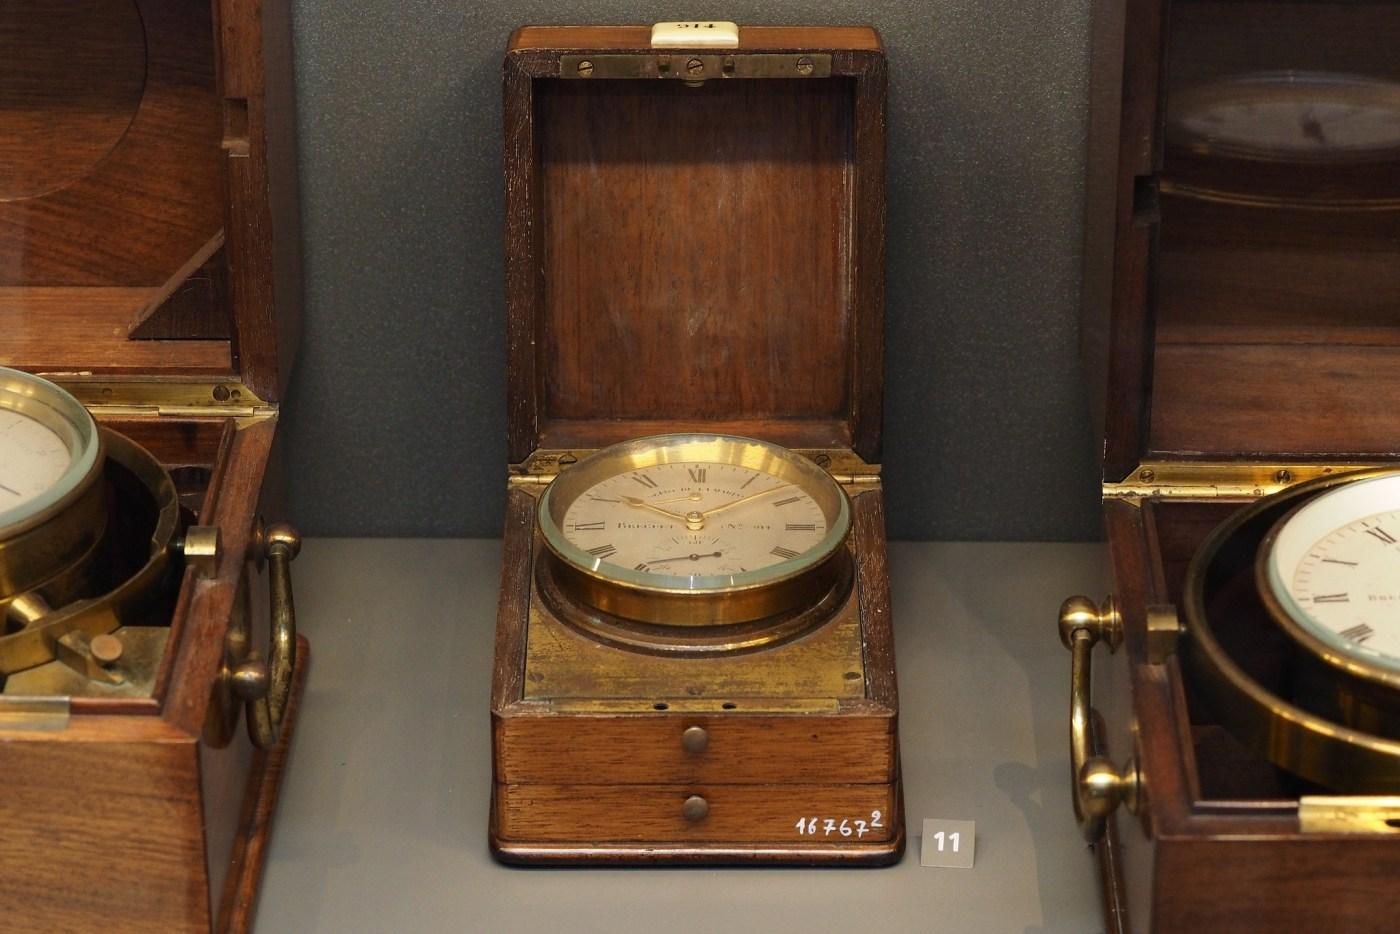 Breguet Marine Chronometer seen in Breguet Museum of Paris